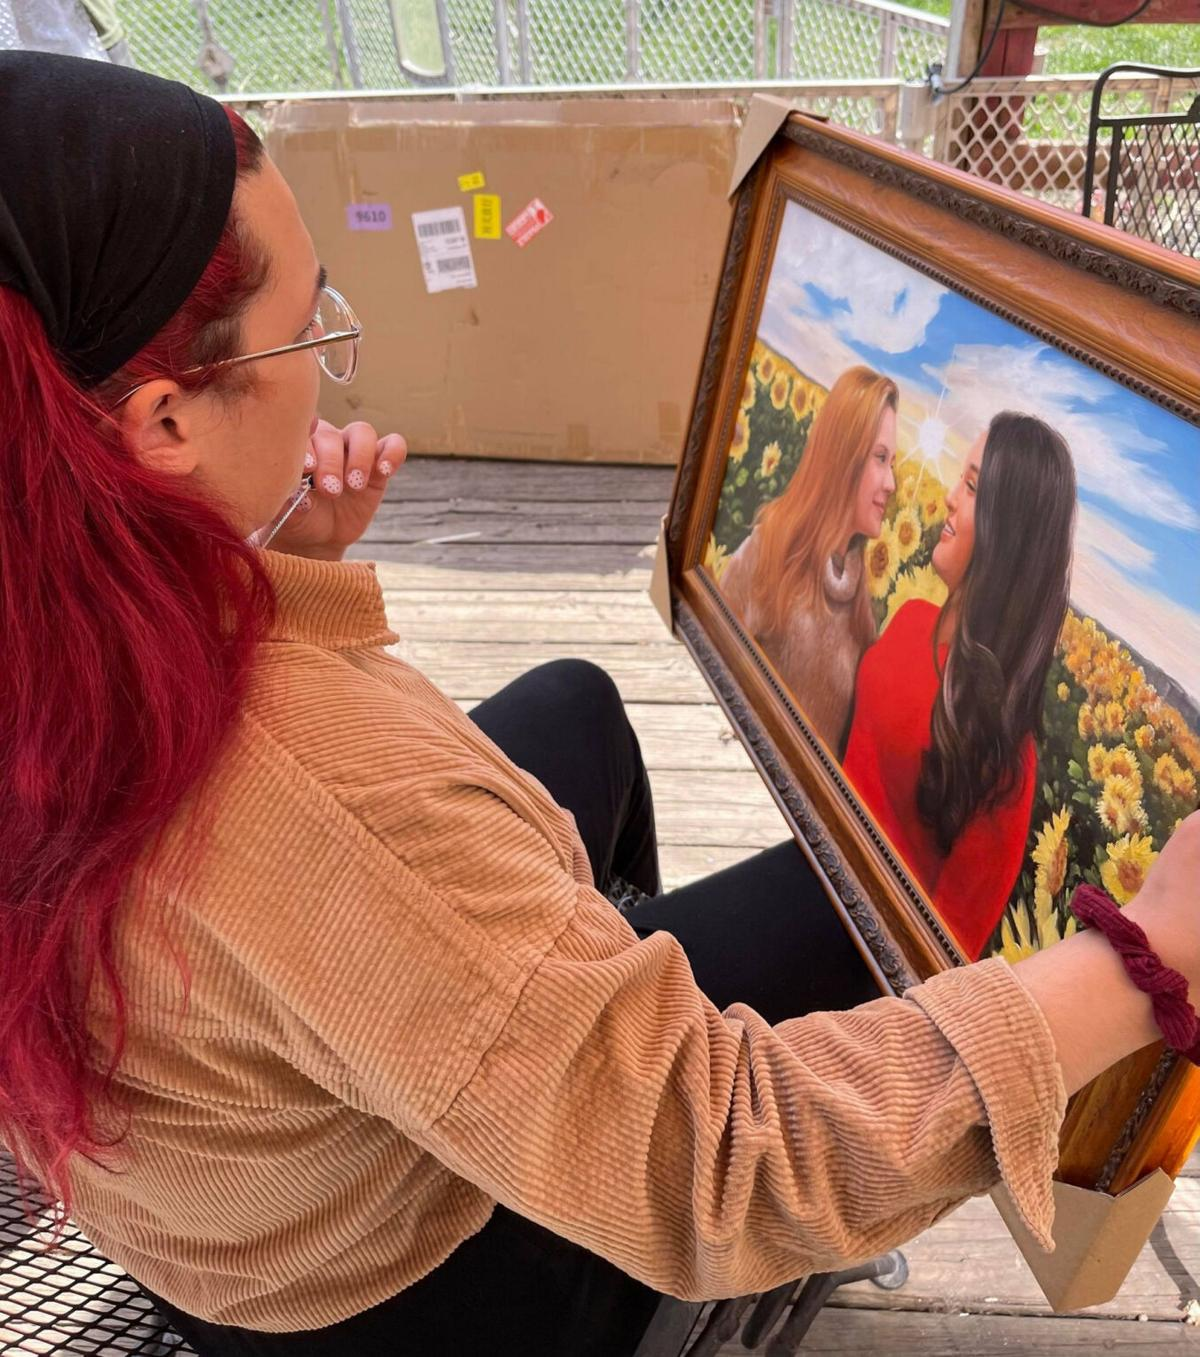 Paintings memorialize teen found lying on city riverwalk